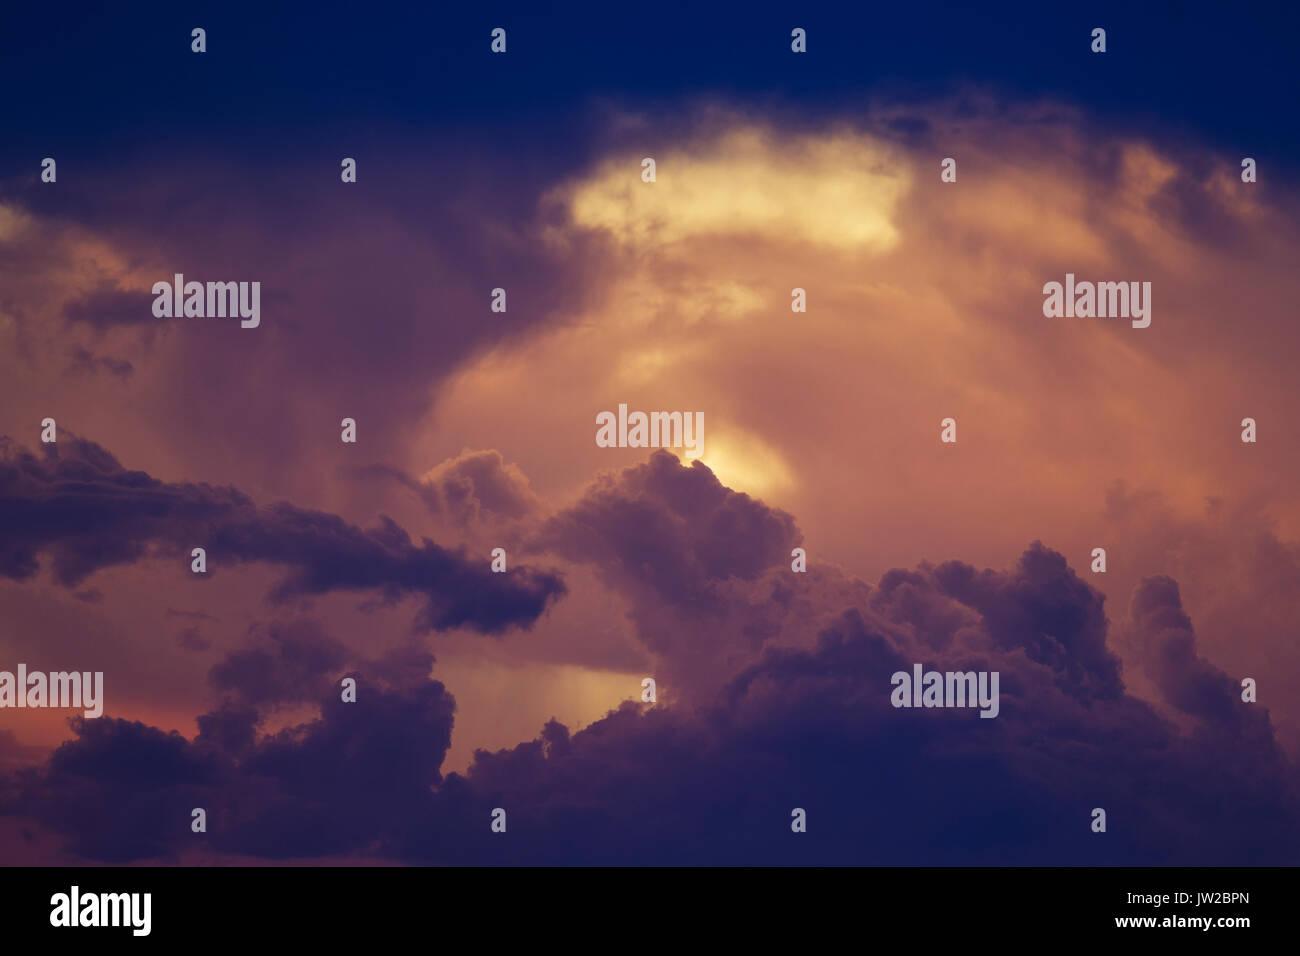 Cumulonimbus clouds in the evening, rainy season, Kalahari Desert, Kgalagadi Transfrontier Park, South Africa - Stock Image